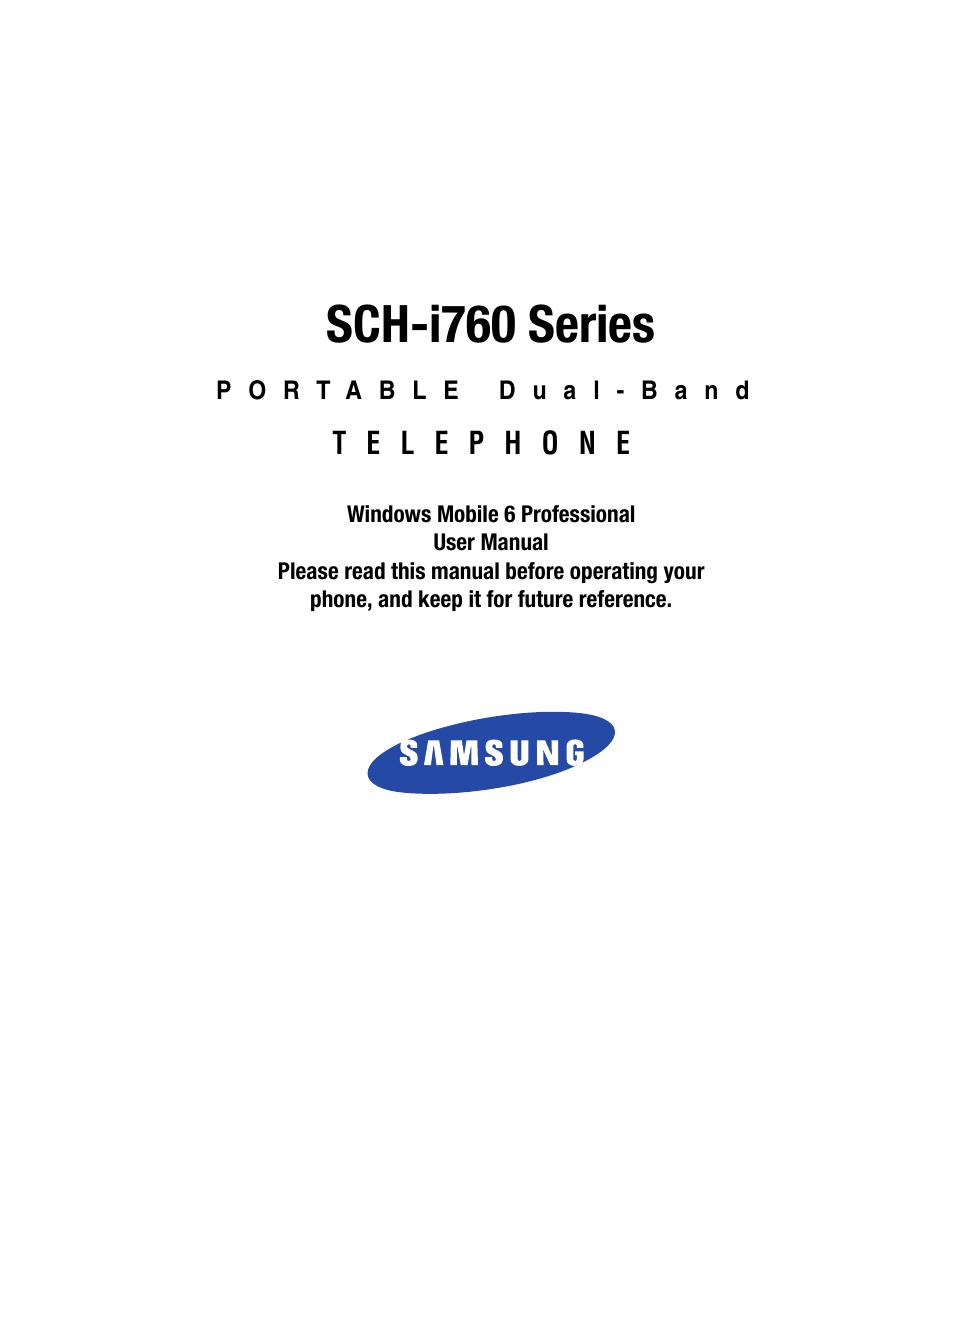 samsung sch i760 user manual 191 pages rh manualsdir com HTC XV6900 Android Samsung SCH-i760